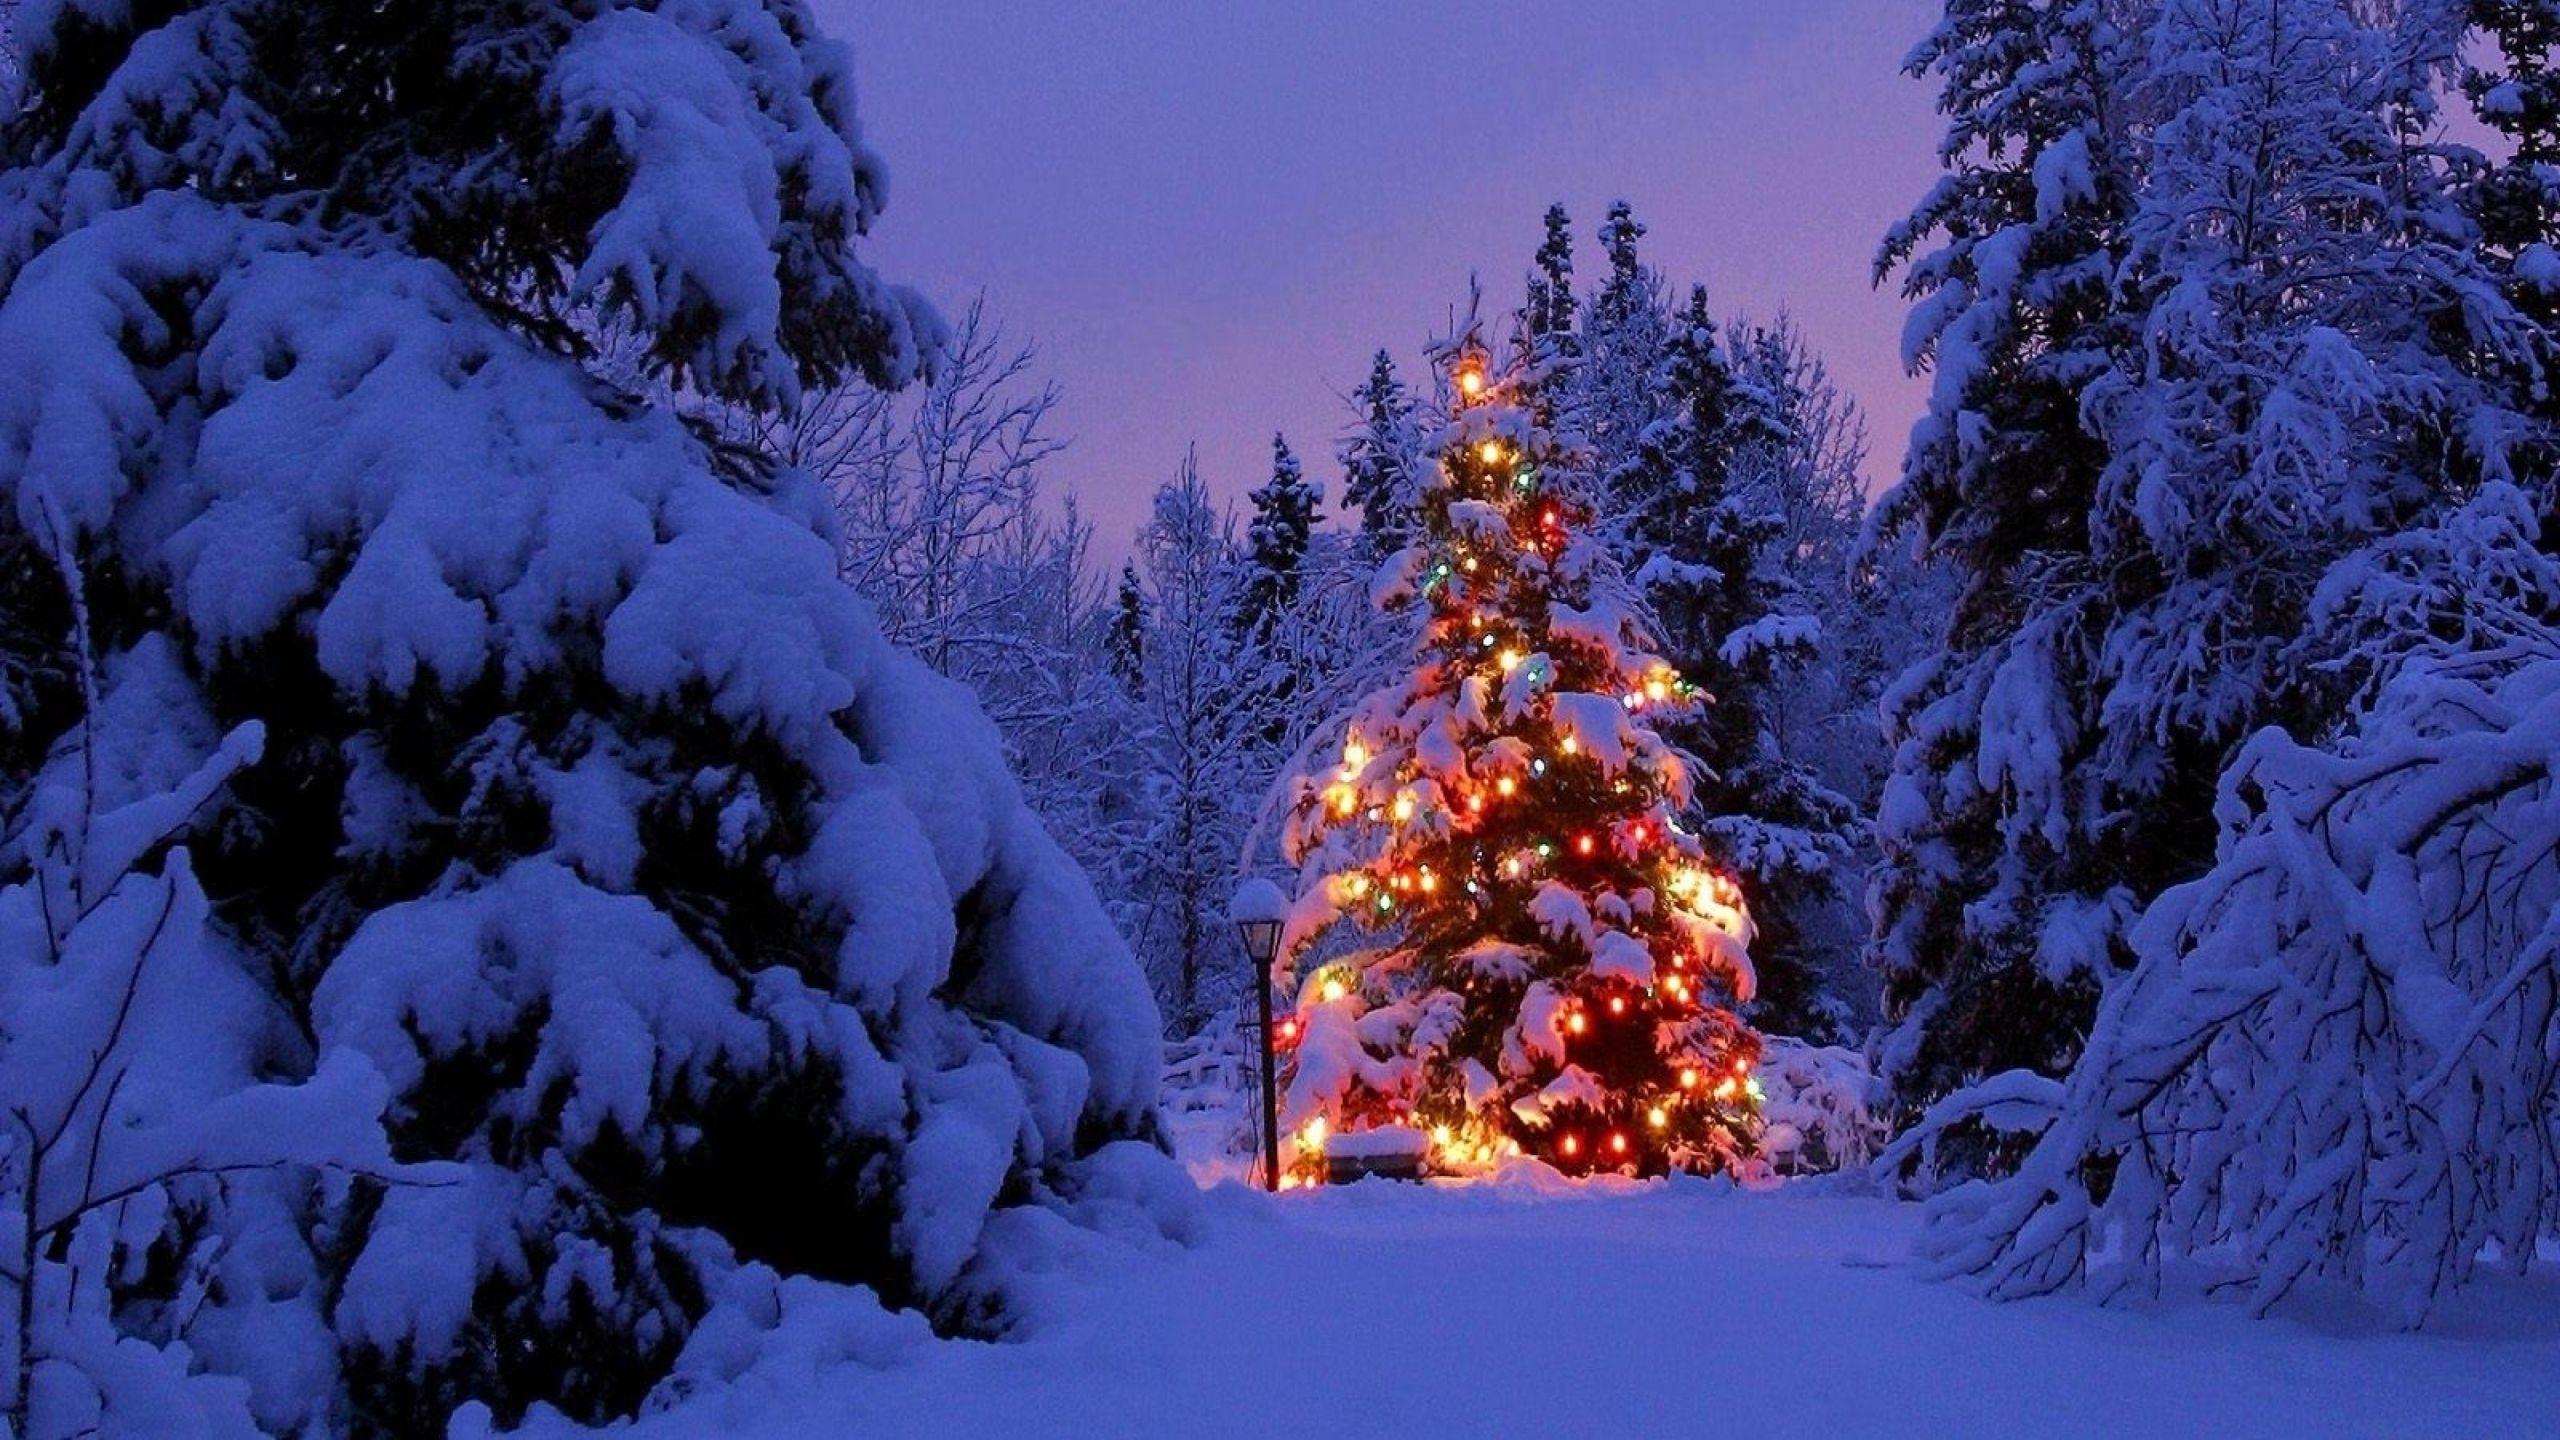 Sapin De Noël Dans La Forêt 2560x1440 Fond Décran Hd